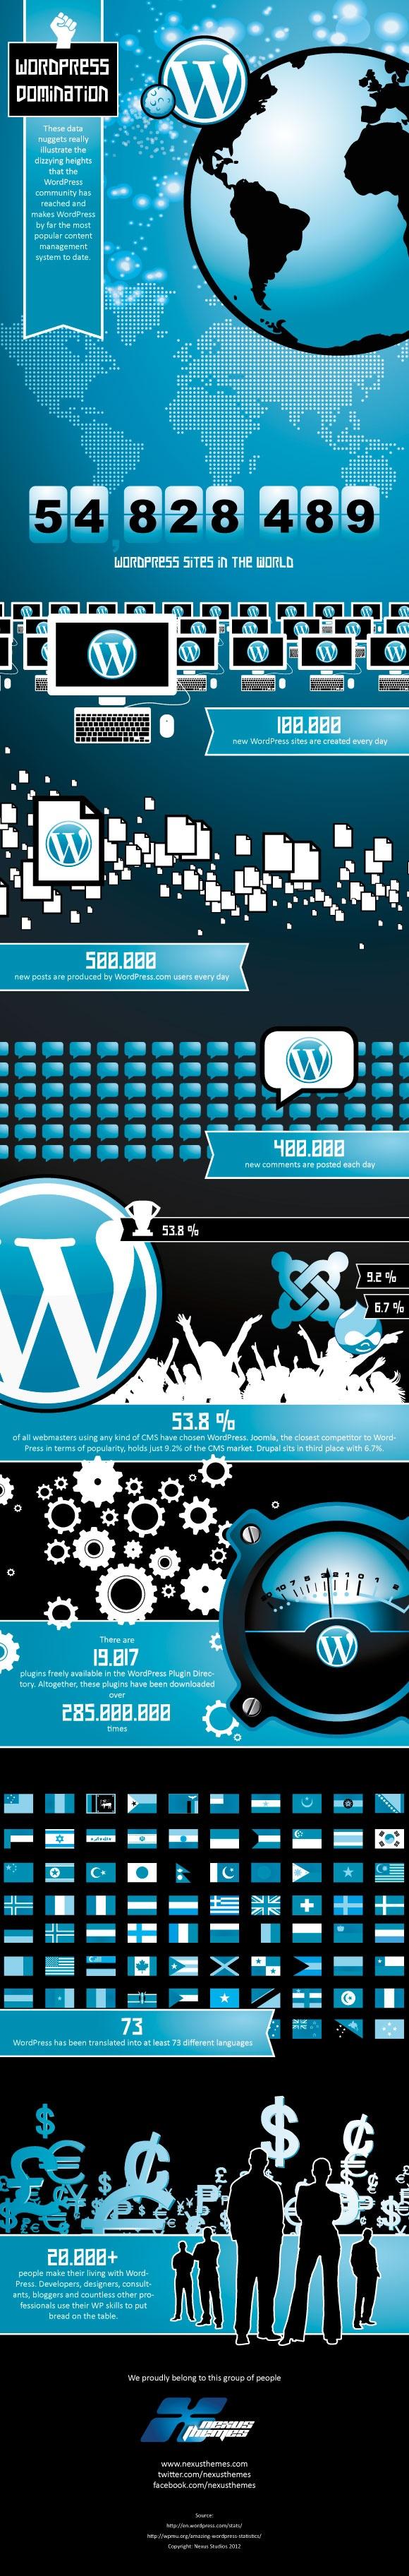 WordPress Domination